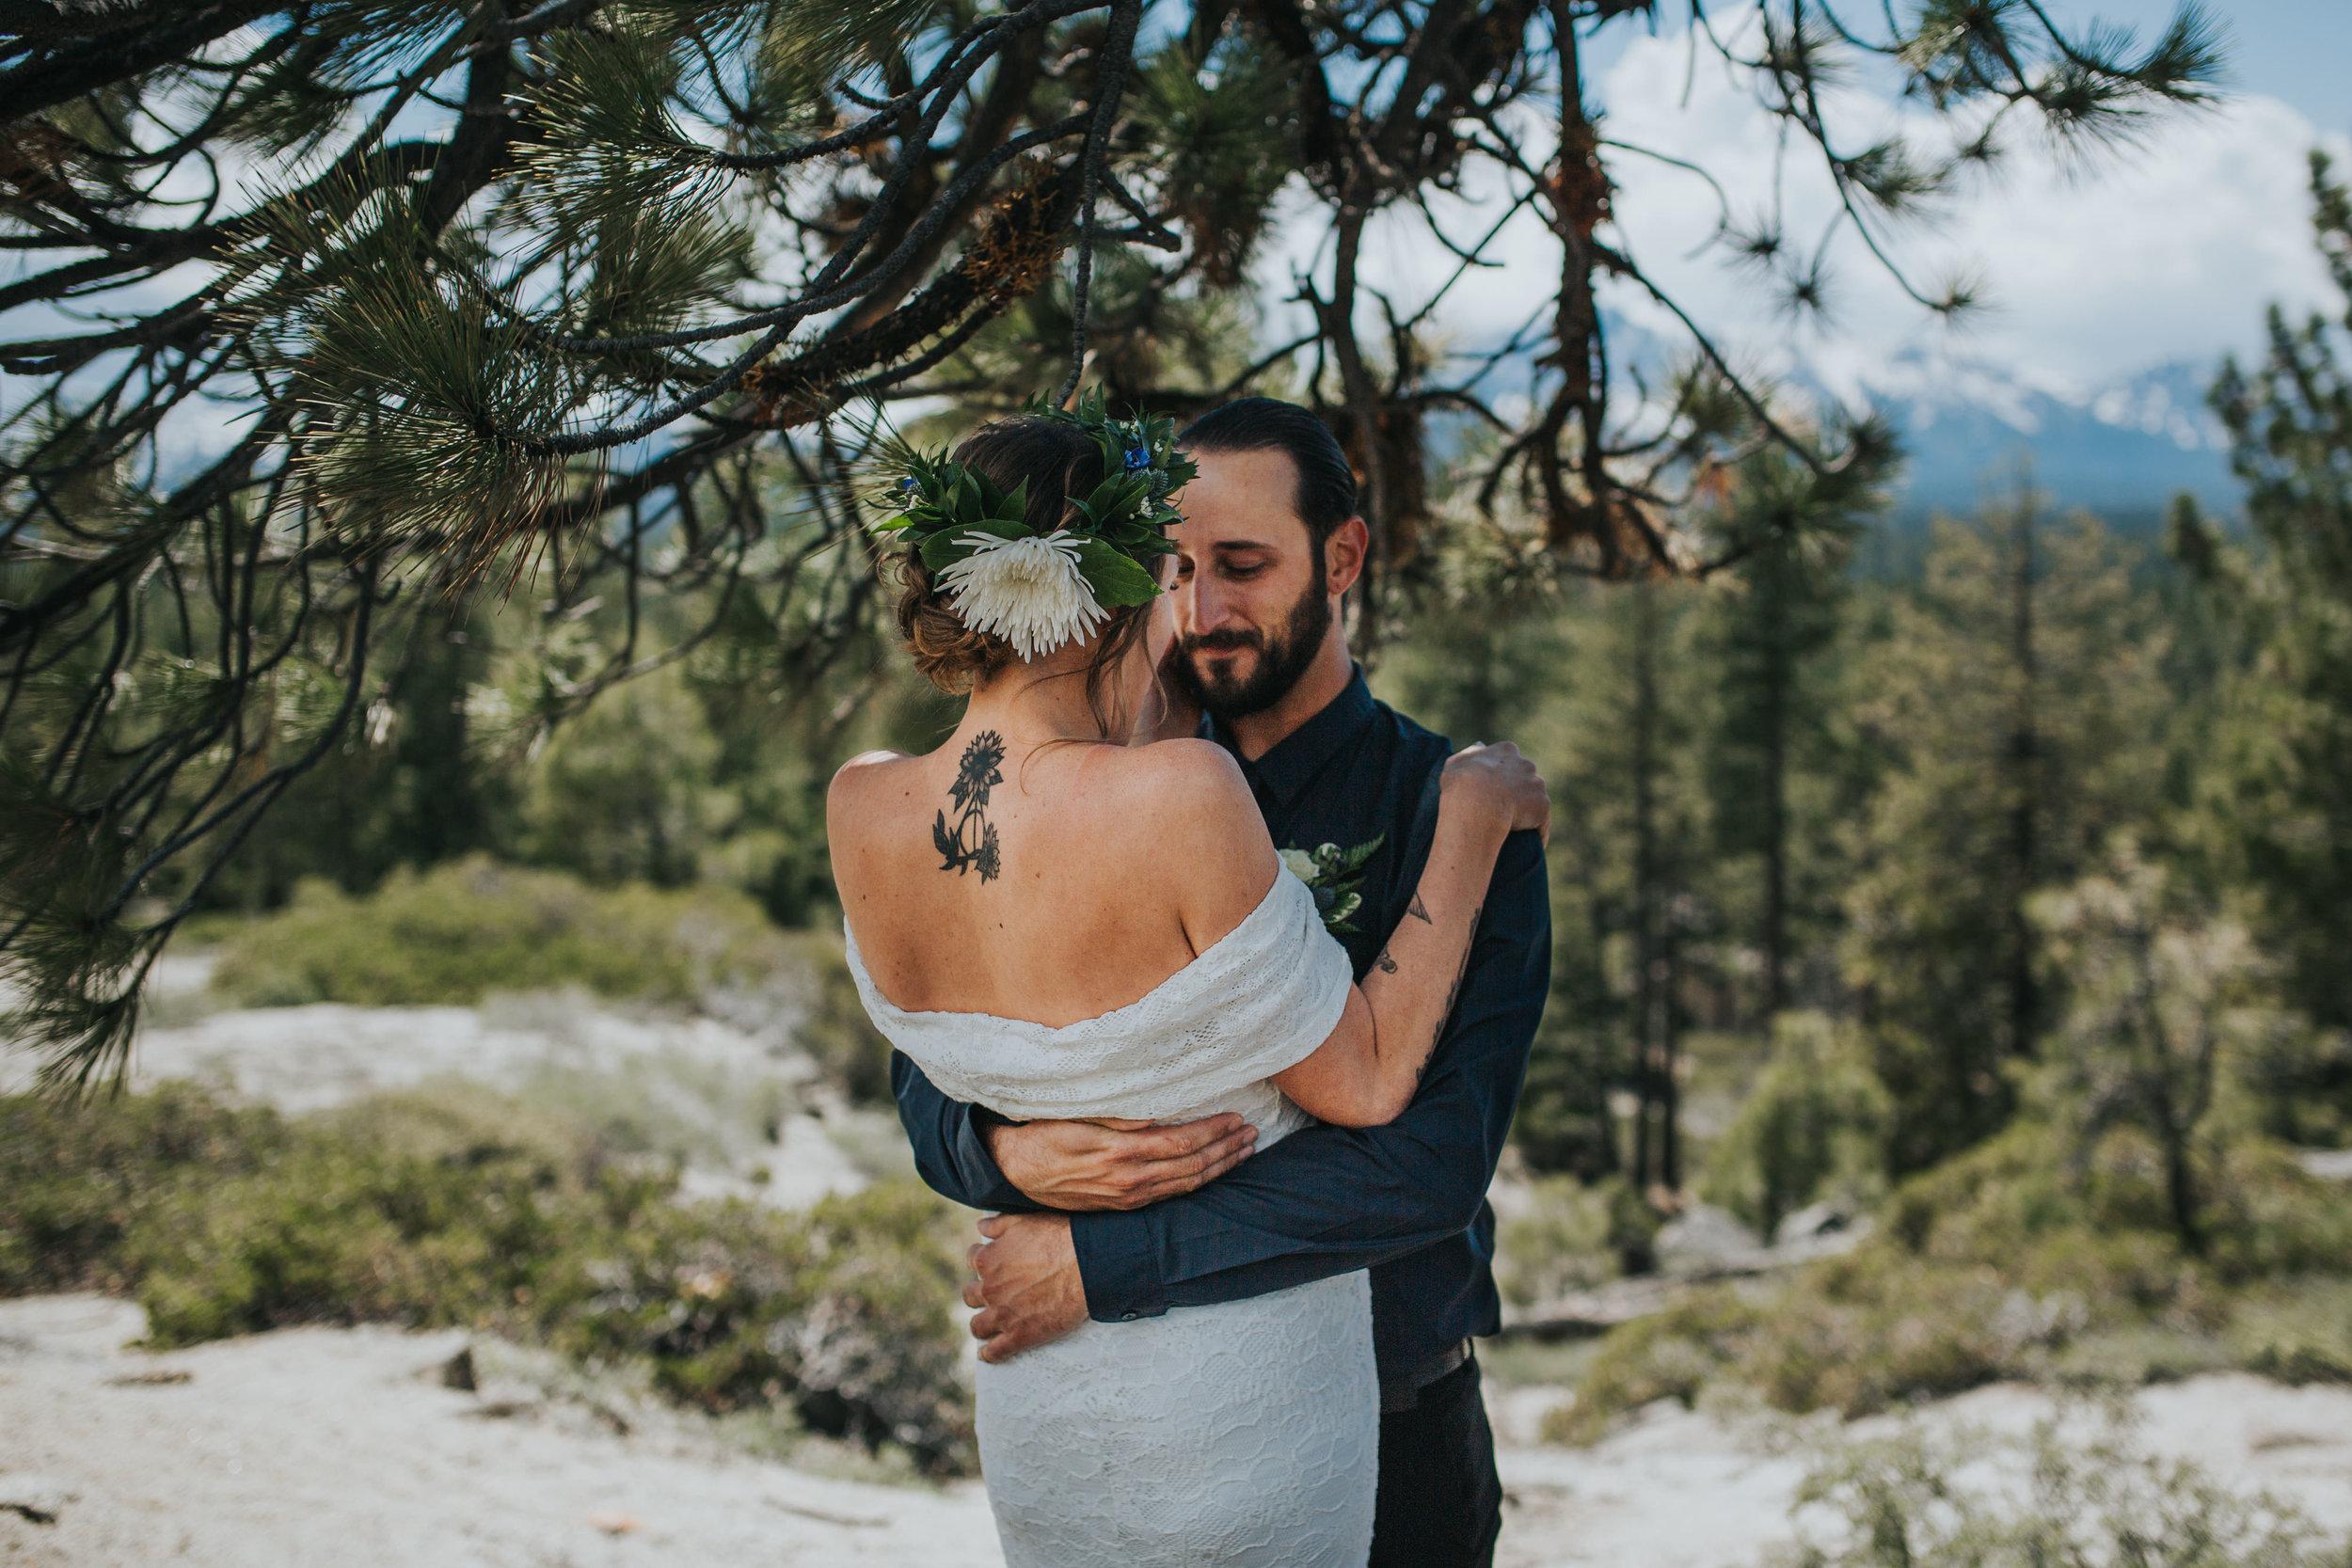 south-lake-tahoe-elopement-valerie-lendvay-photo-016.jpg